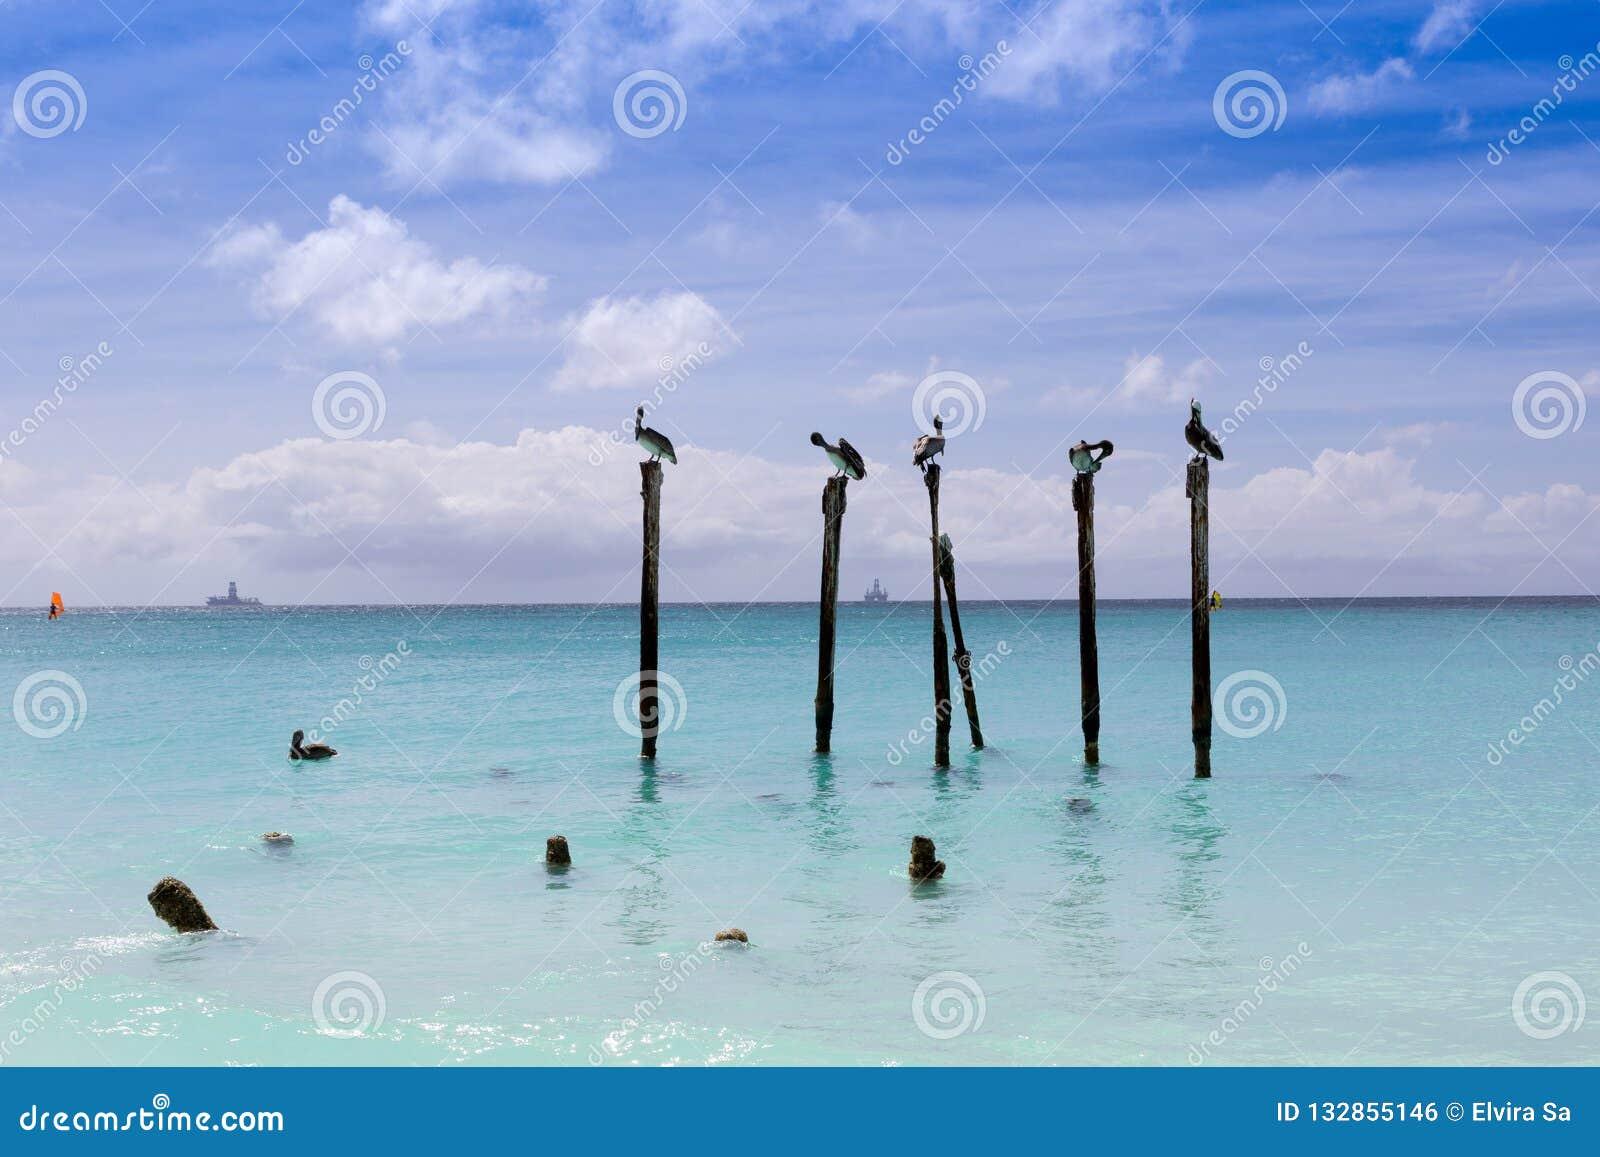 Eagle beach in Aruba. Pelicans on wood